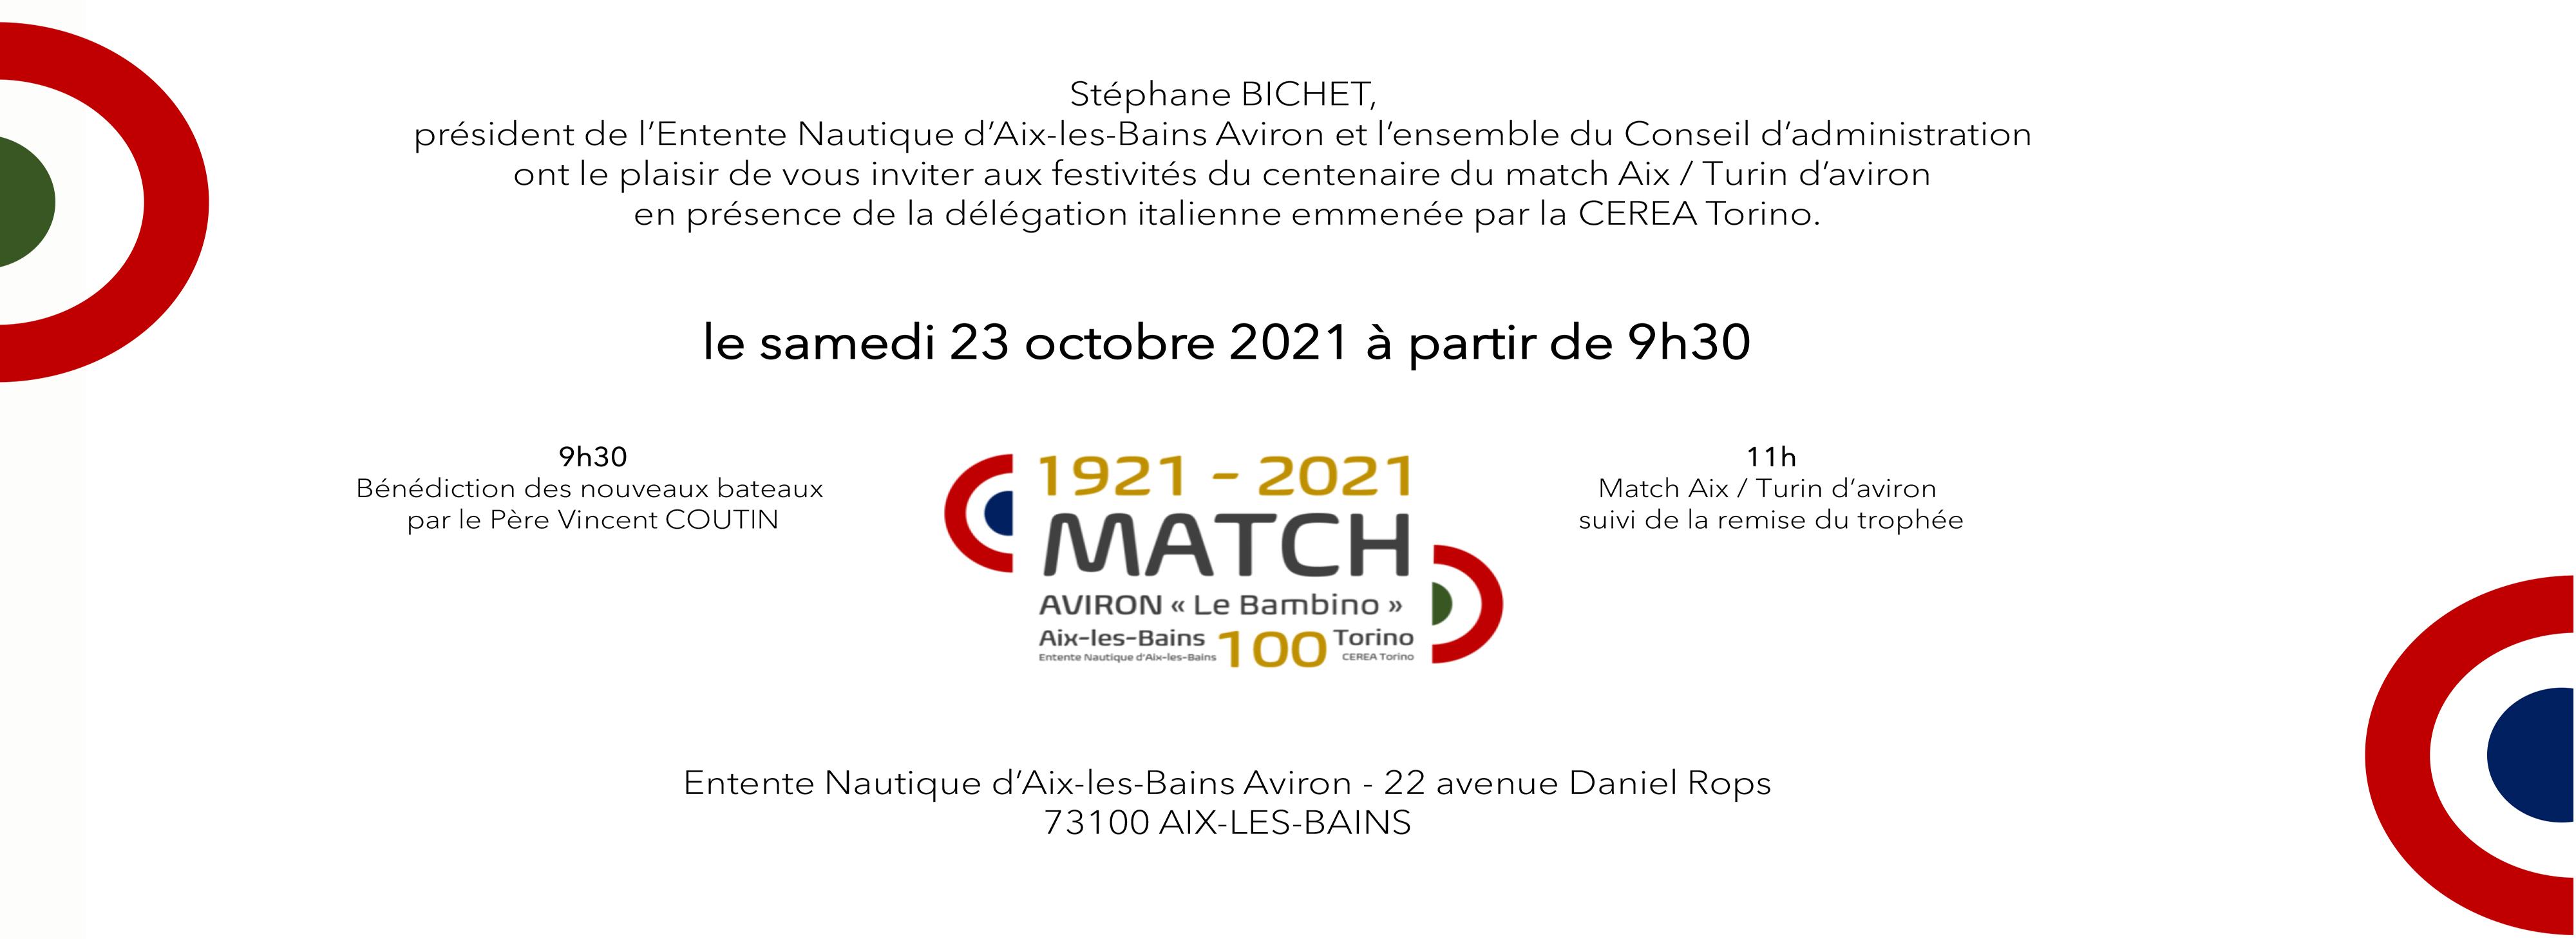 INVITATION-Centenaire-du-match-Aix-Turin-3